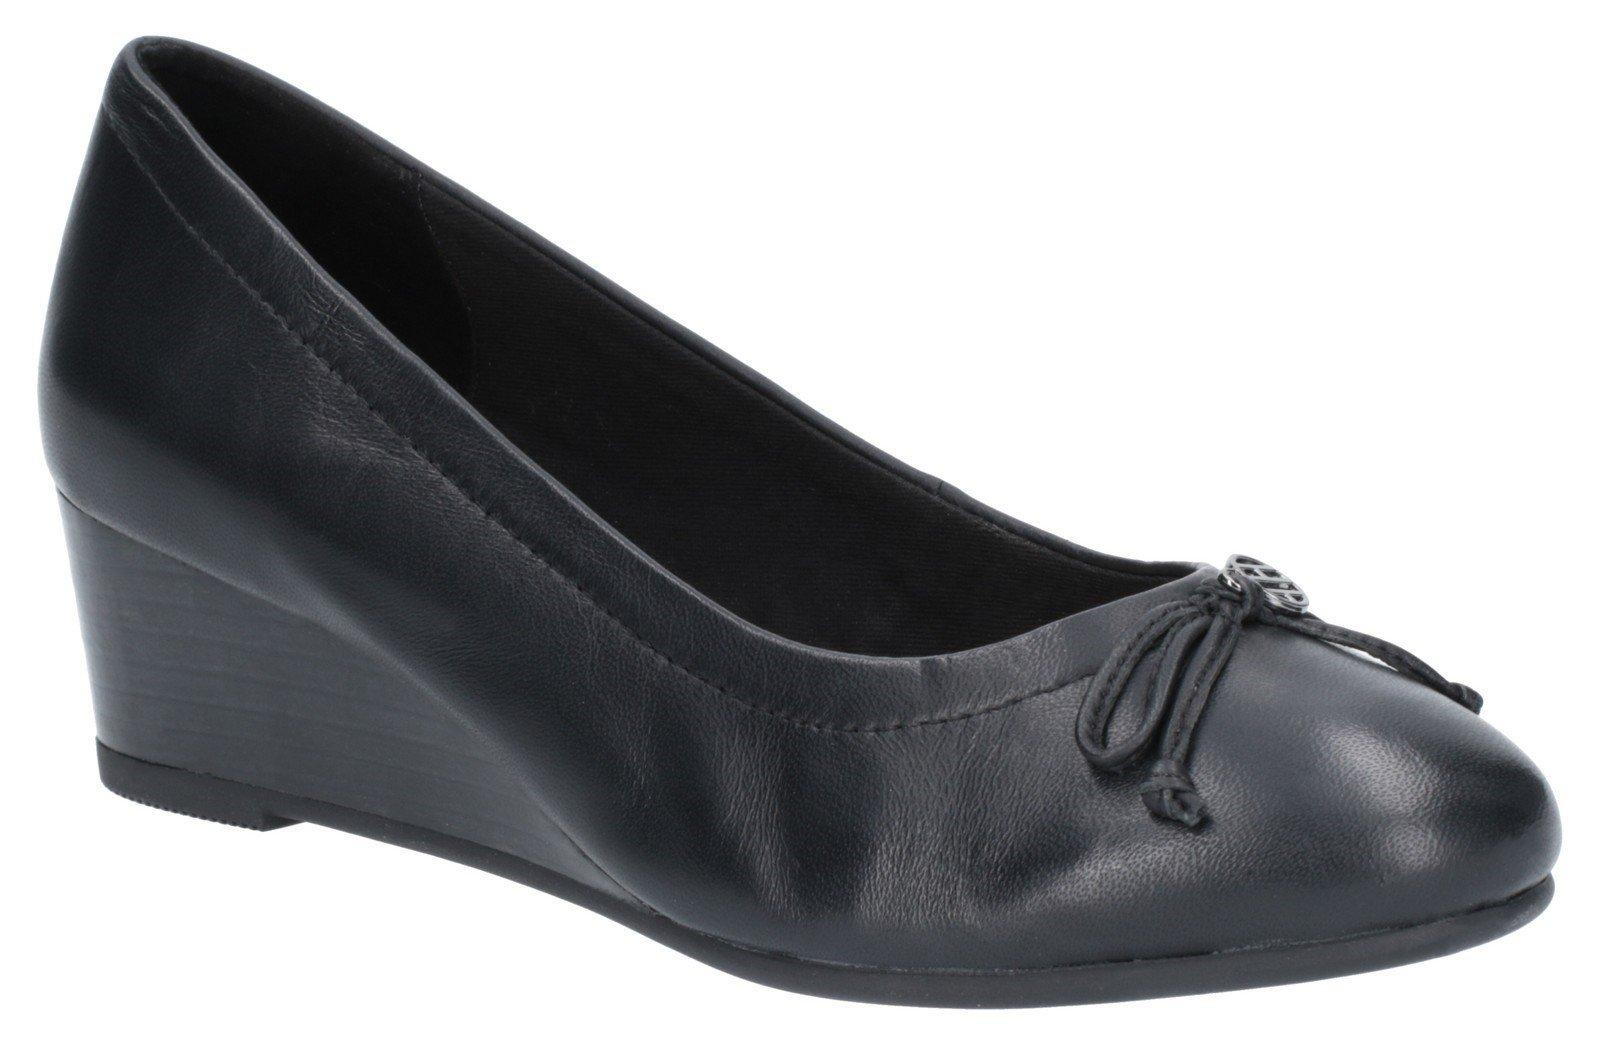 Hush Puppies Women's Morkie Charm Wedge Shoe Black 27380 - Black 3